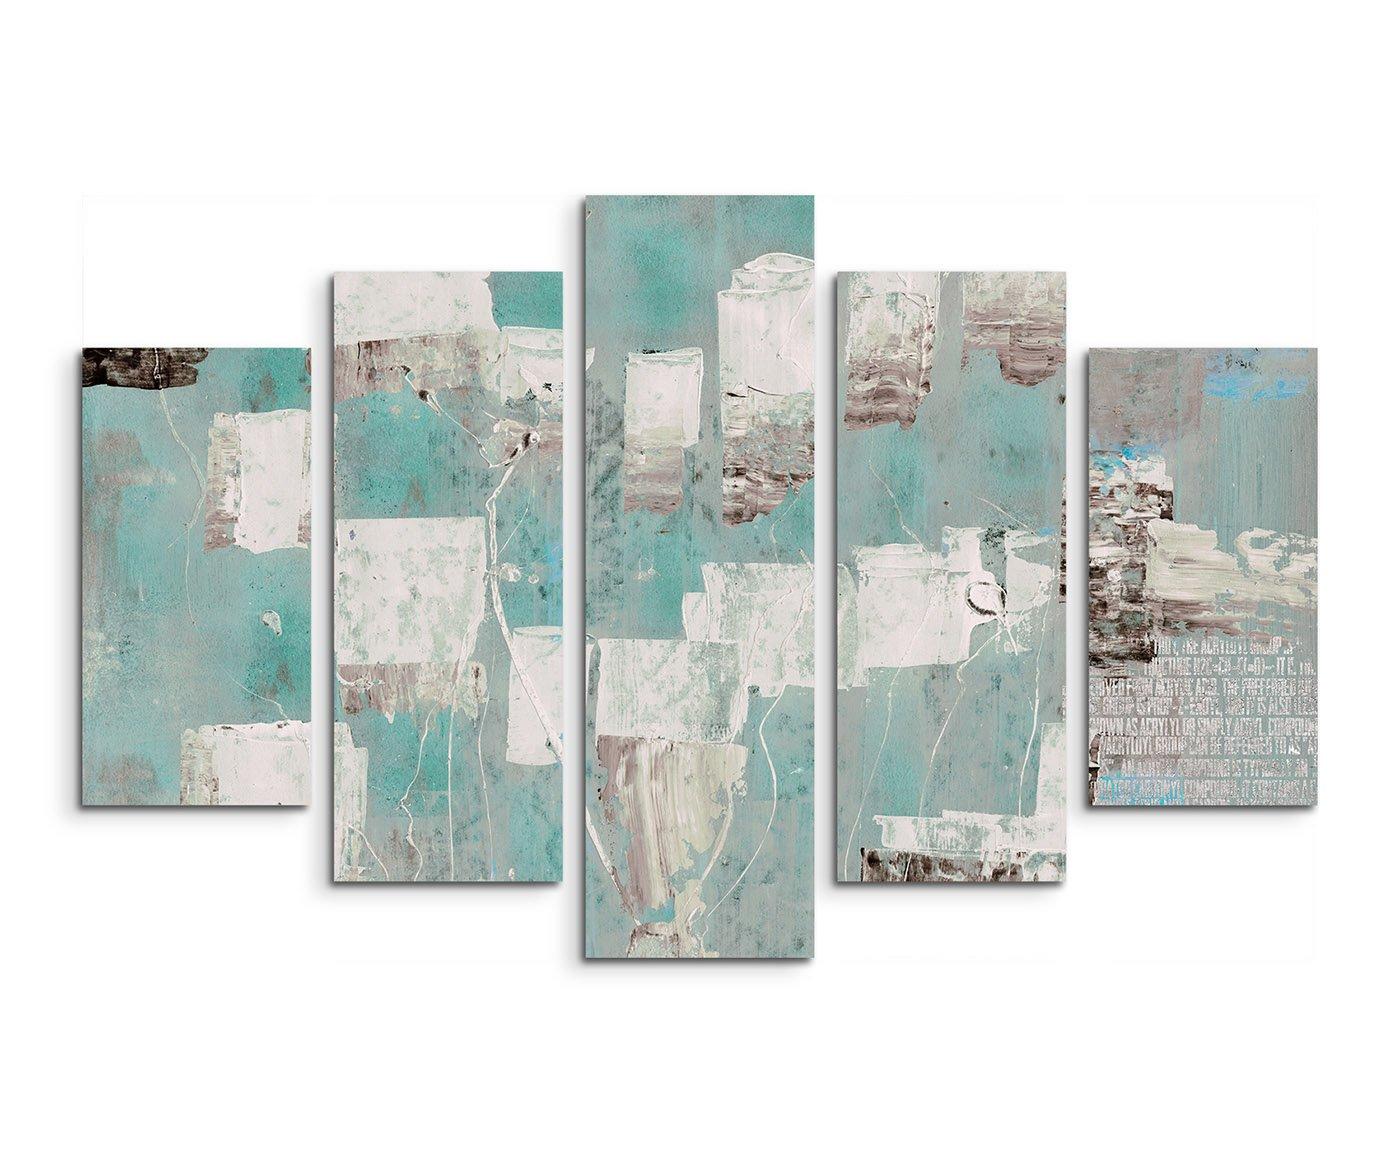 5 teiliges Wandbild auf Leinwand (Gesamt  H  100cm B  160cm) Keilrahmenbild Canvas Fotodruck Leinwandbild Leinwanddruck Kunstdruck Wandbild türkis blau beige grau